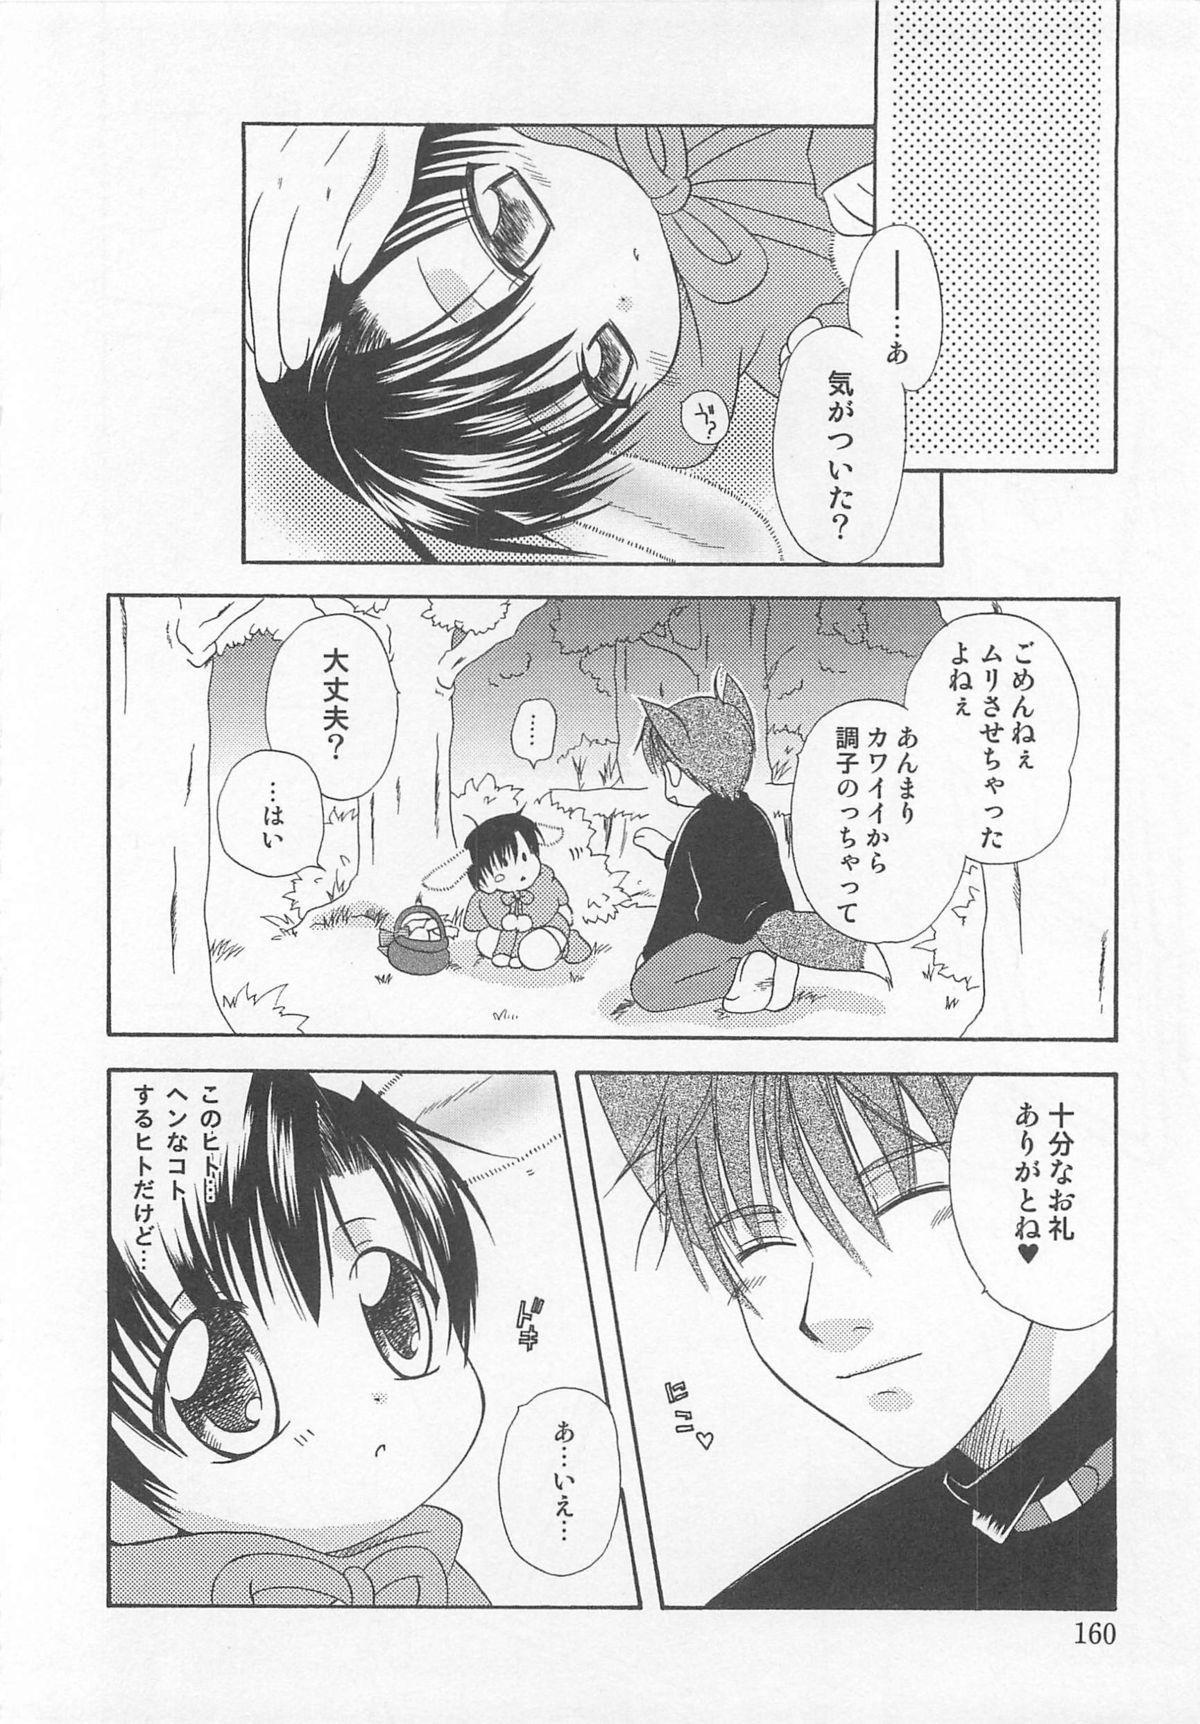 Otokonoko HEAVEN Vol. 02 Dokidoki Chikan Taiken 162